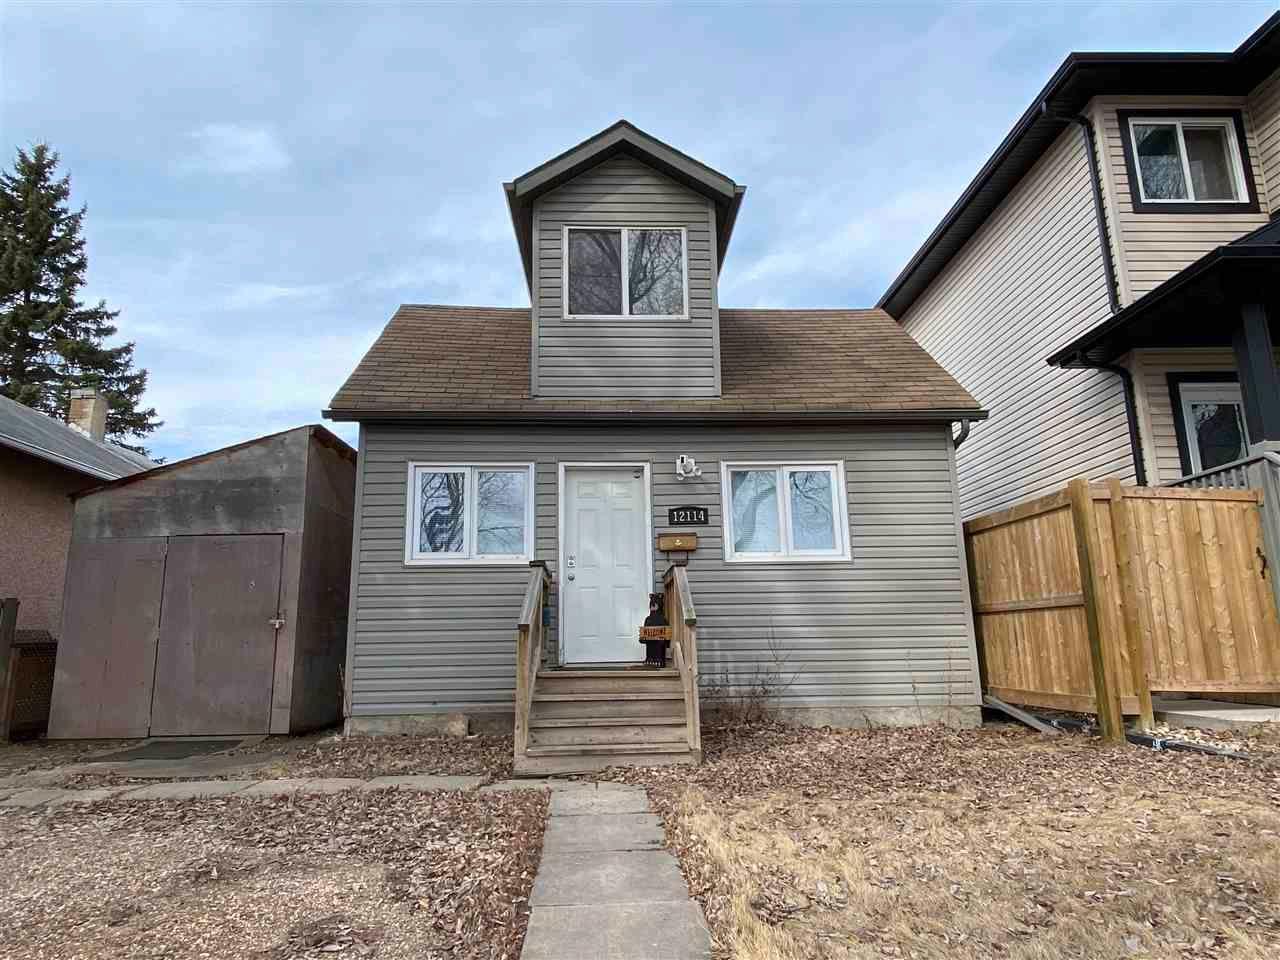 Main Photo: 12114 85 Street in Edmonton: Zone 05 House for sale : MLS®# E4247162